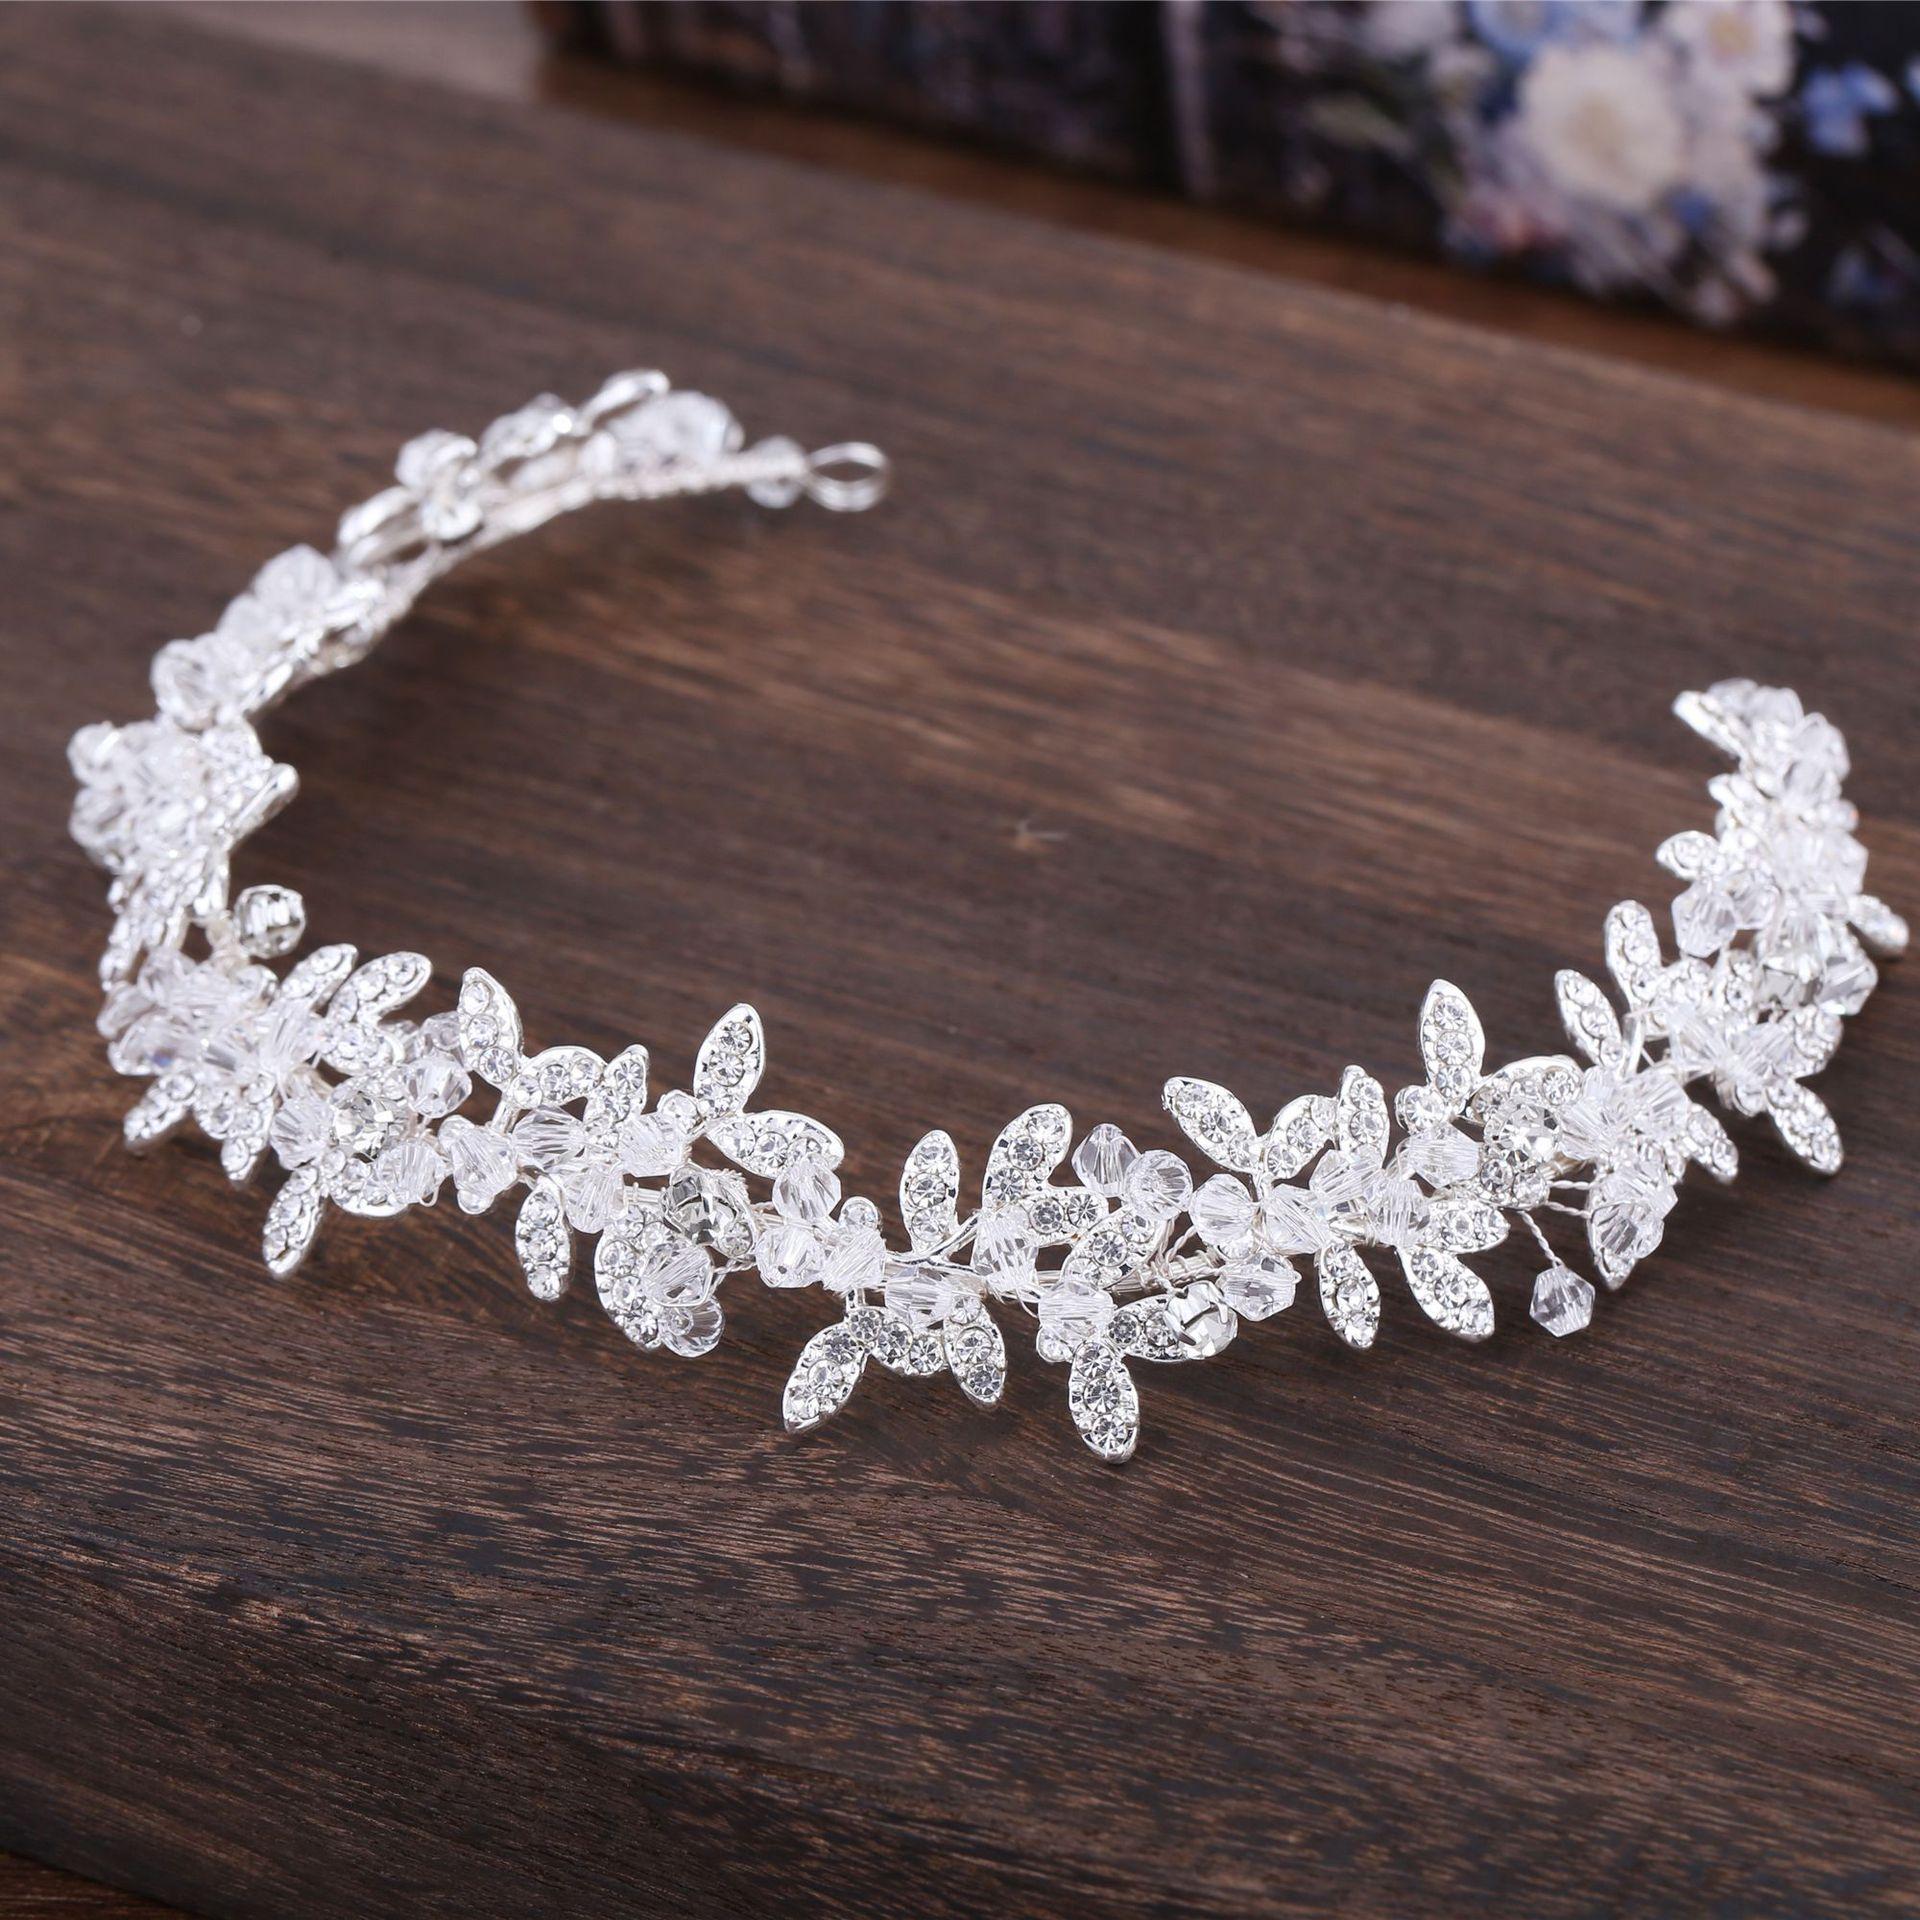 Wholesale Handmade Clear Crystal Beaded Wedding Tiara Bride Headbands Women  Prom Headdress Bridal Hair Jewelry Accessories UK 2019 From Guichenring 490039922c82